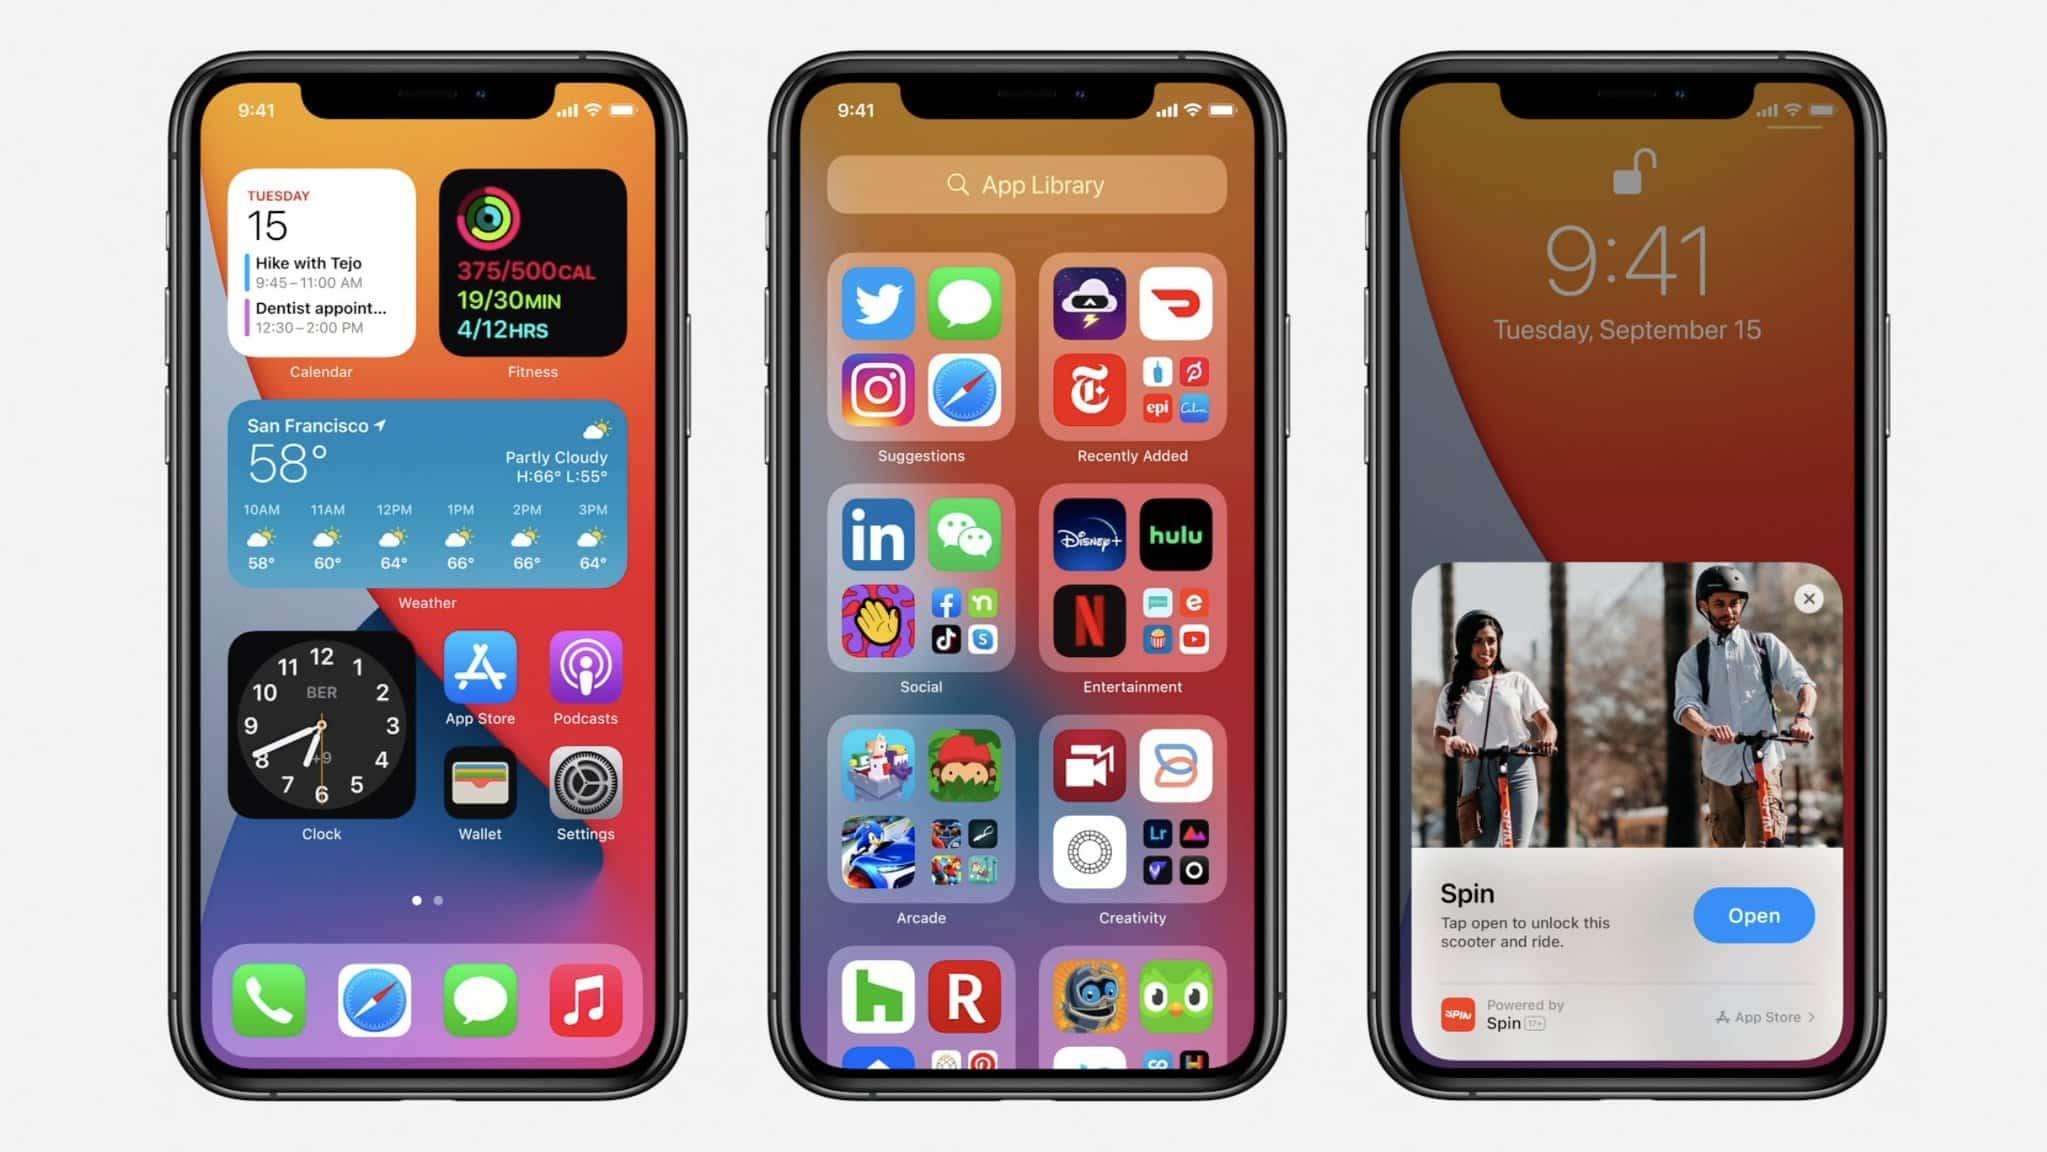 iOS 14, iPadOS 14, watchOS 7, and tvOS 14